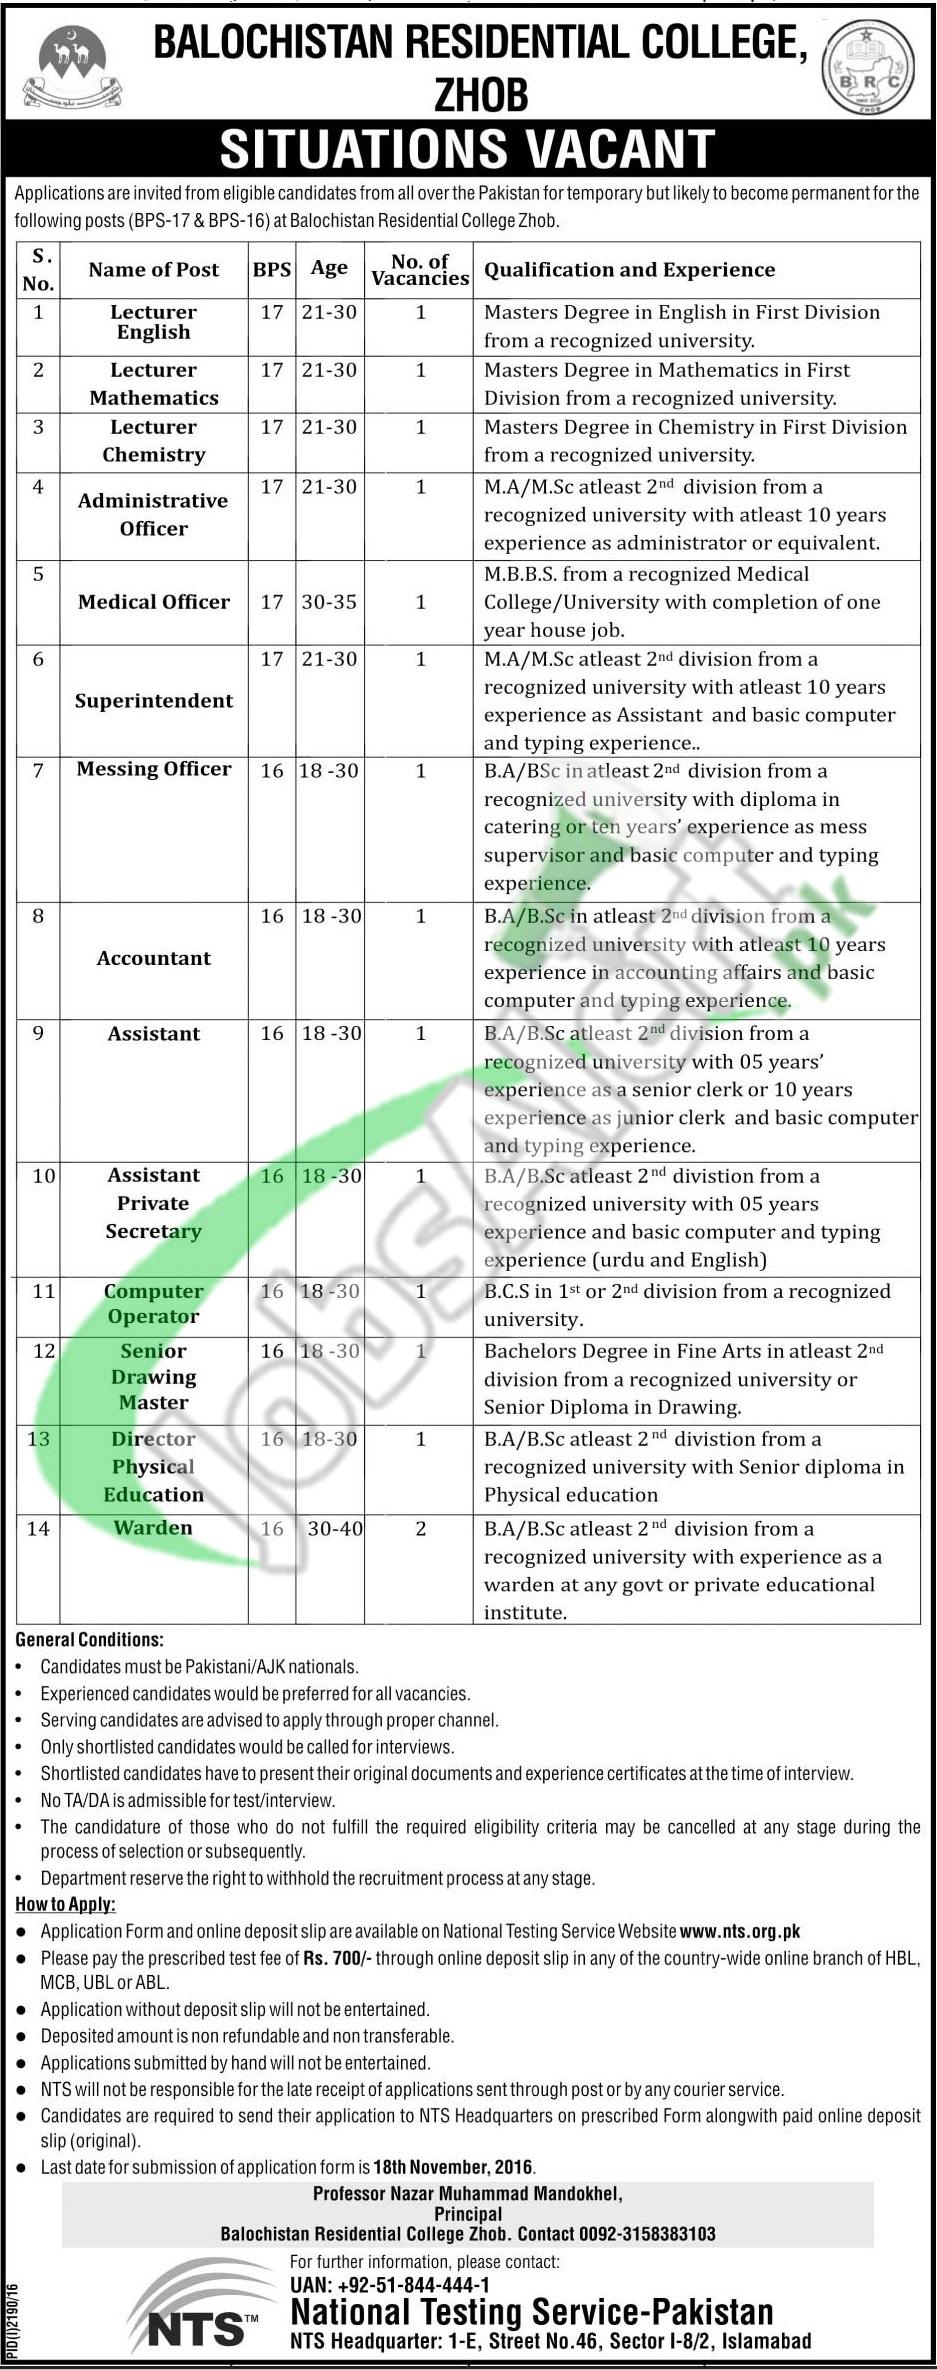 NTS BRC Zhob Jobs 2016 Balochistan Residential College Latest